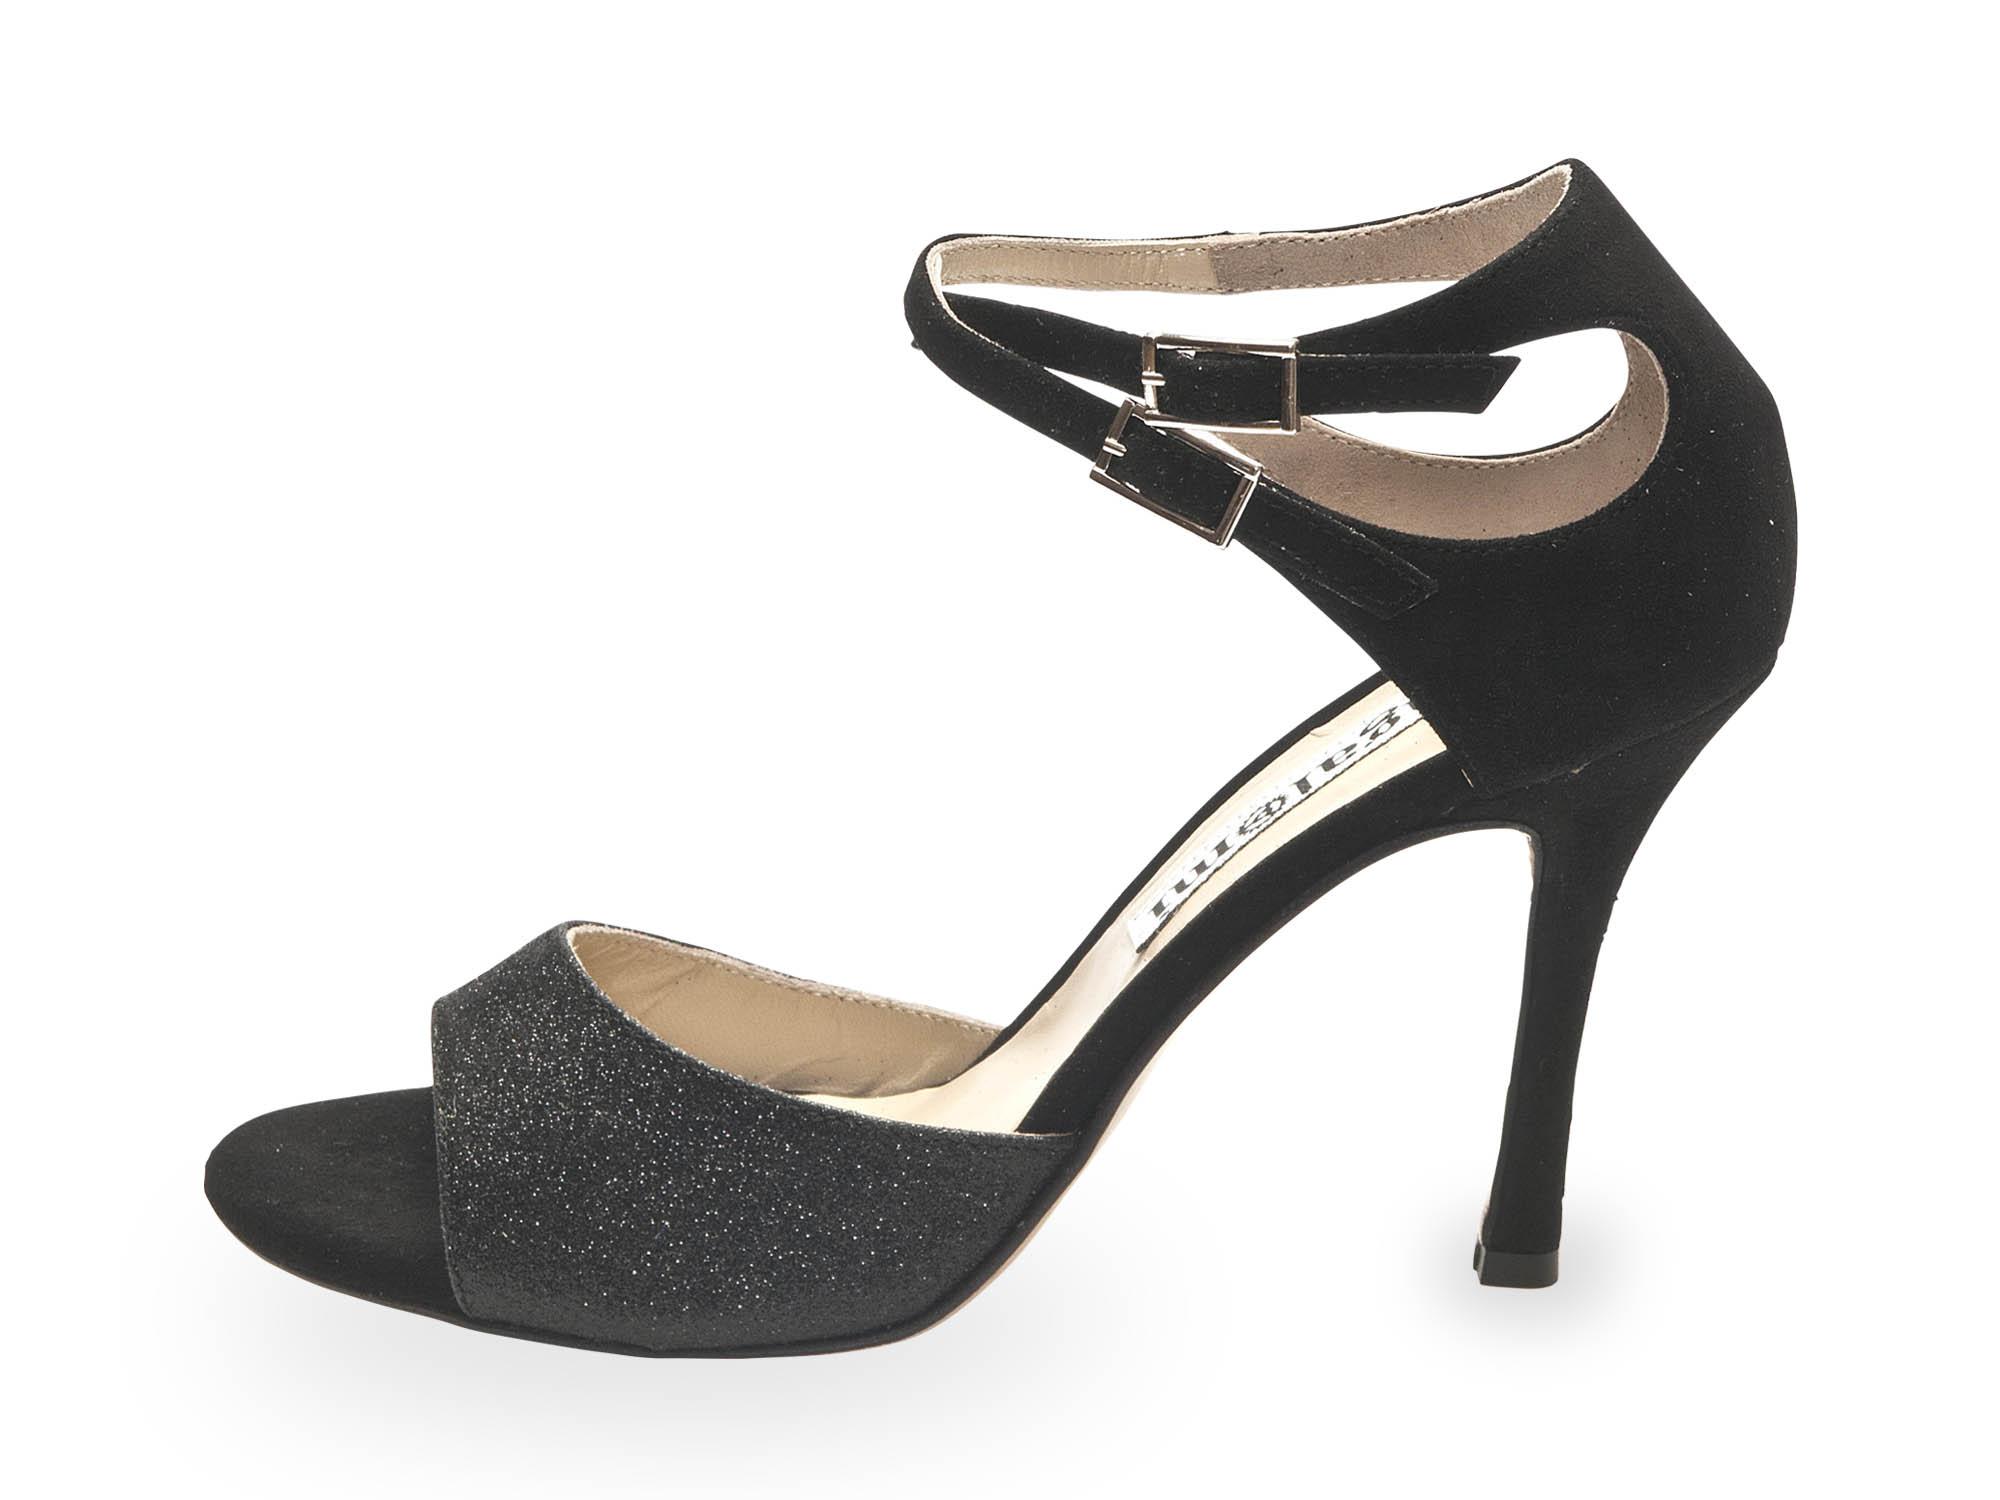 Soho (B) Black Glitter and Black Suede